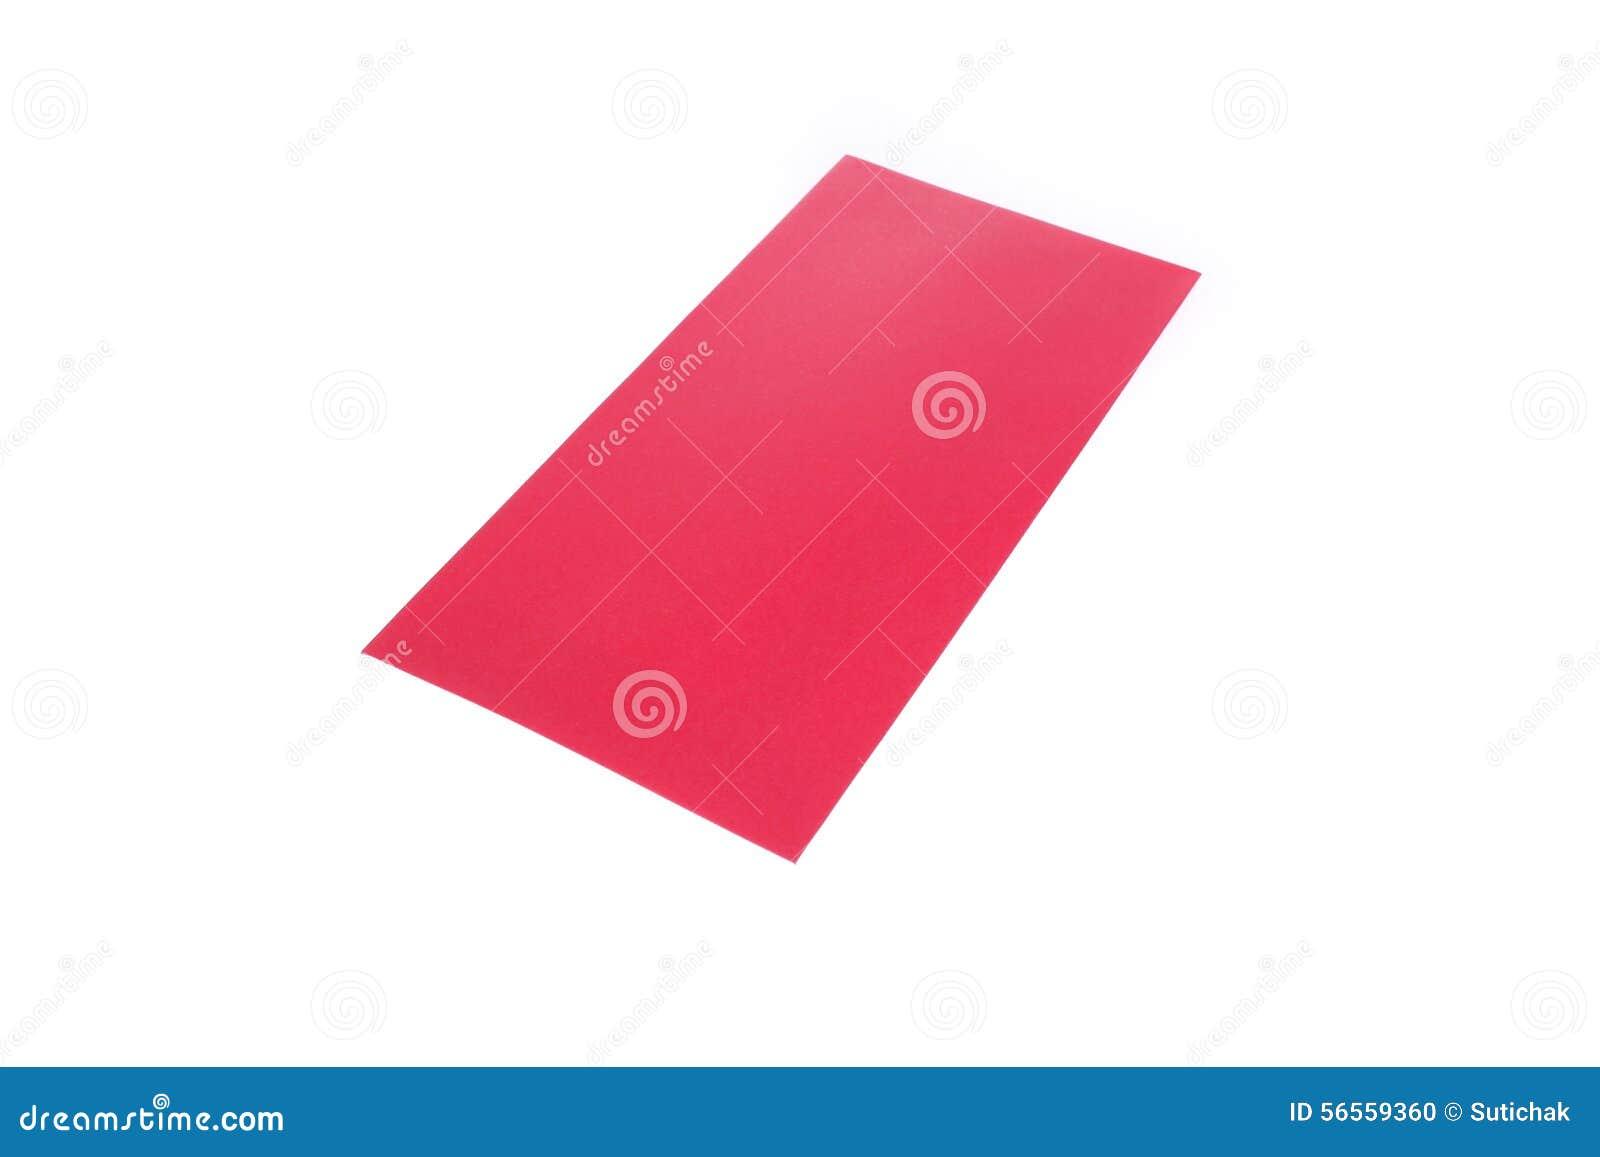 Download Κόκκινος φάκελος που απομονώνεται στο άσπρο υπόβαθρο για το δώρο Στοκ Εικόνες - εικόνα από απομονωμένος, ευημερία: 56559360